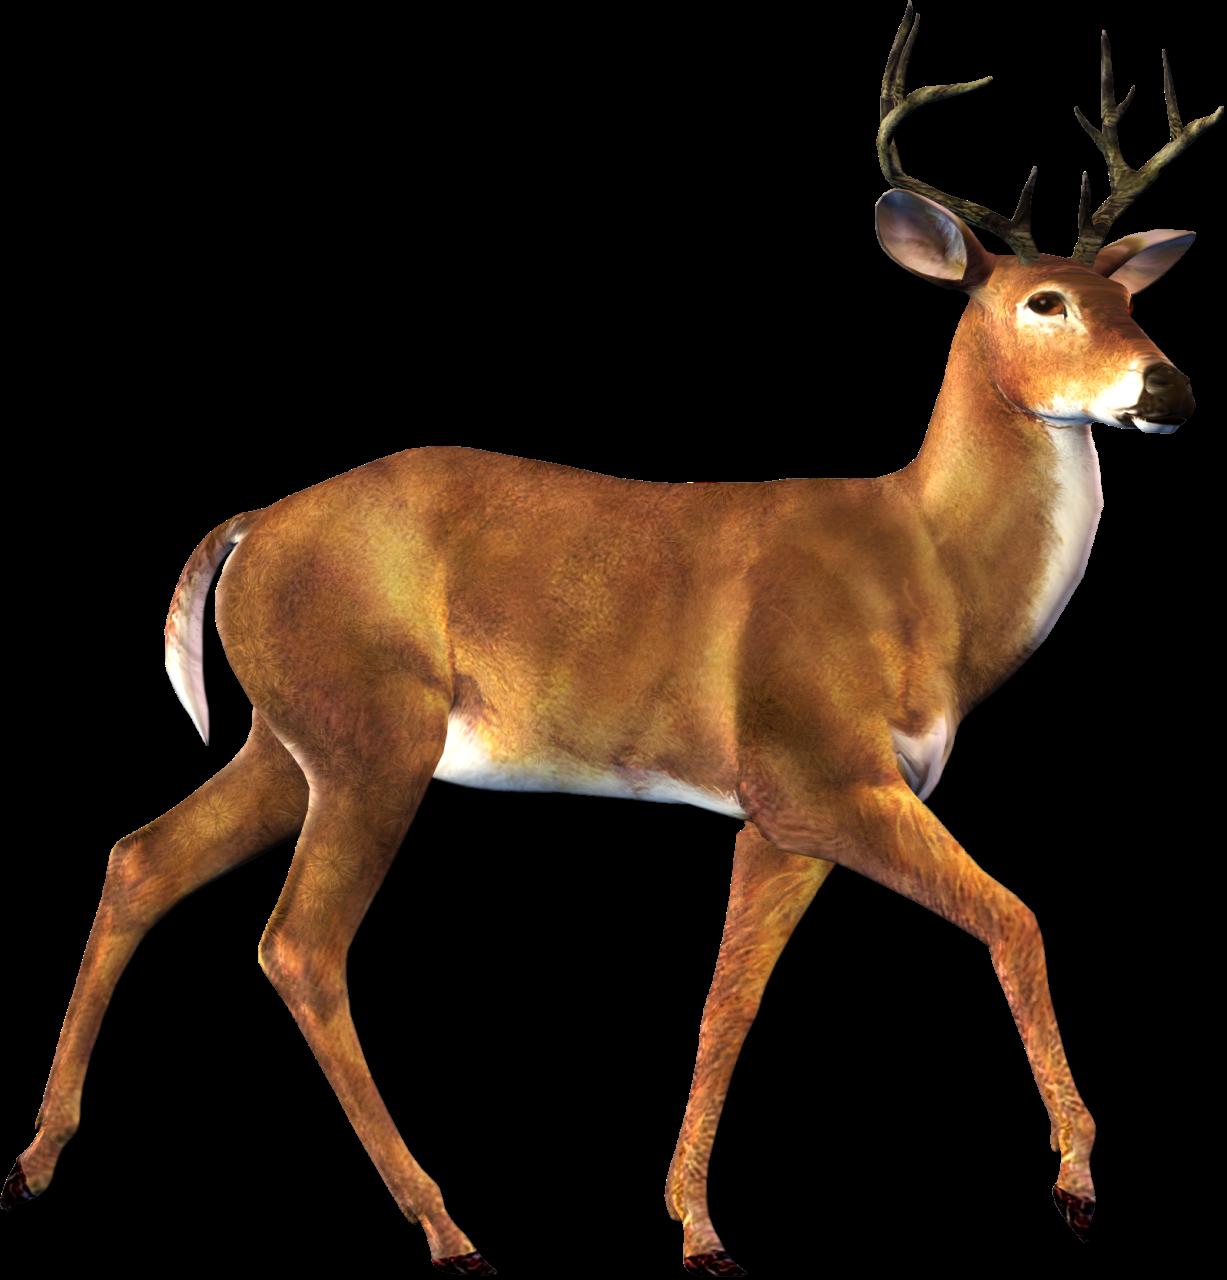 Deer clipart transparent background vector free stock Free Deer Transparent Background, Download Free Clip Art ... vector free stock